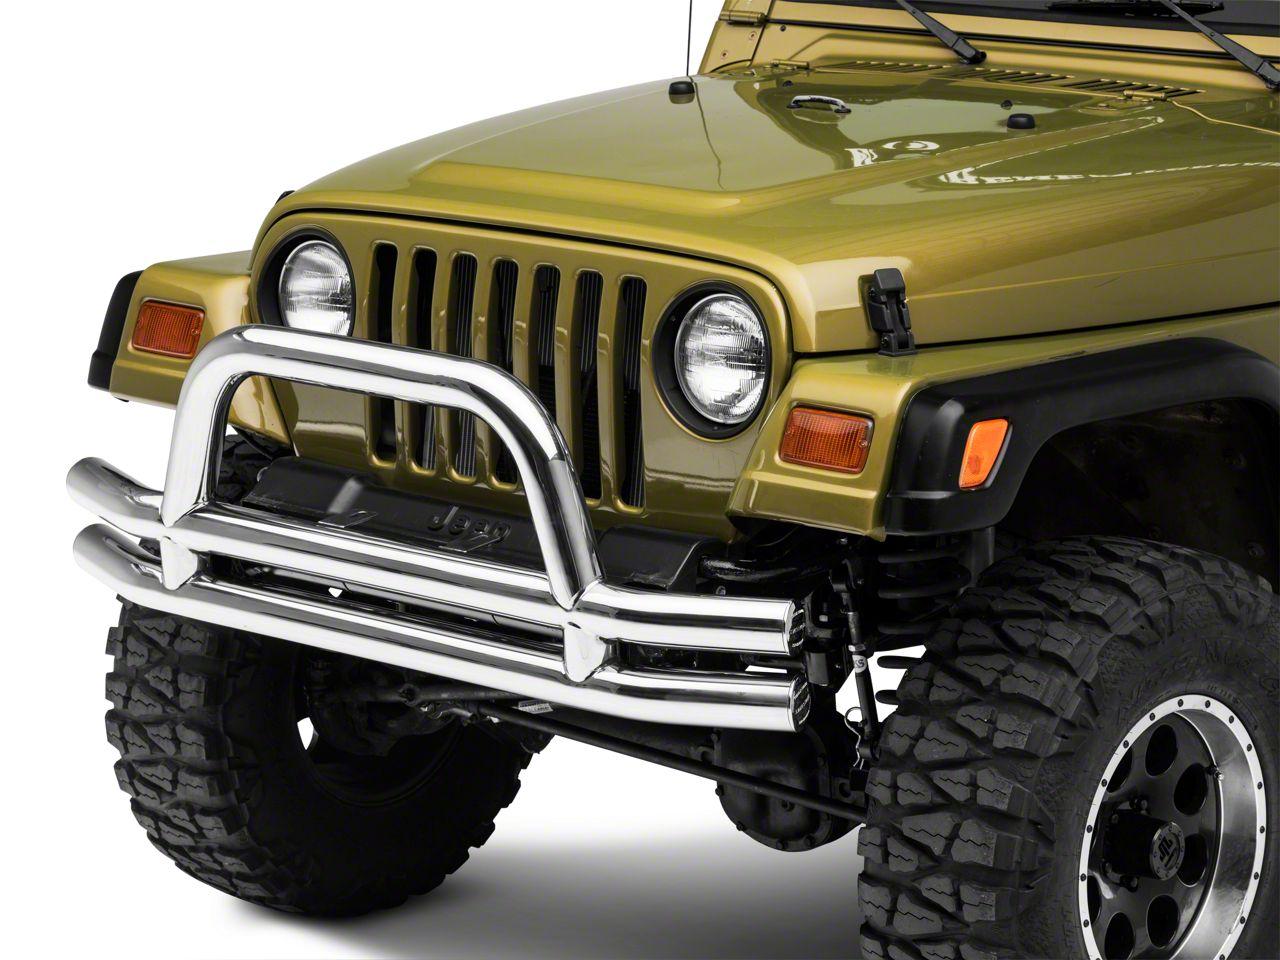 Smittybilt Tubular Front Bumper w/ Hoop - Stainless Steel (87-06 Jeep Wrangler YJ & TJ)